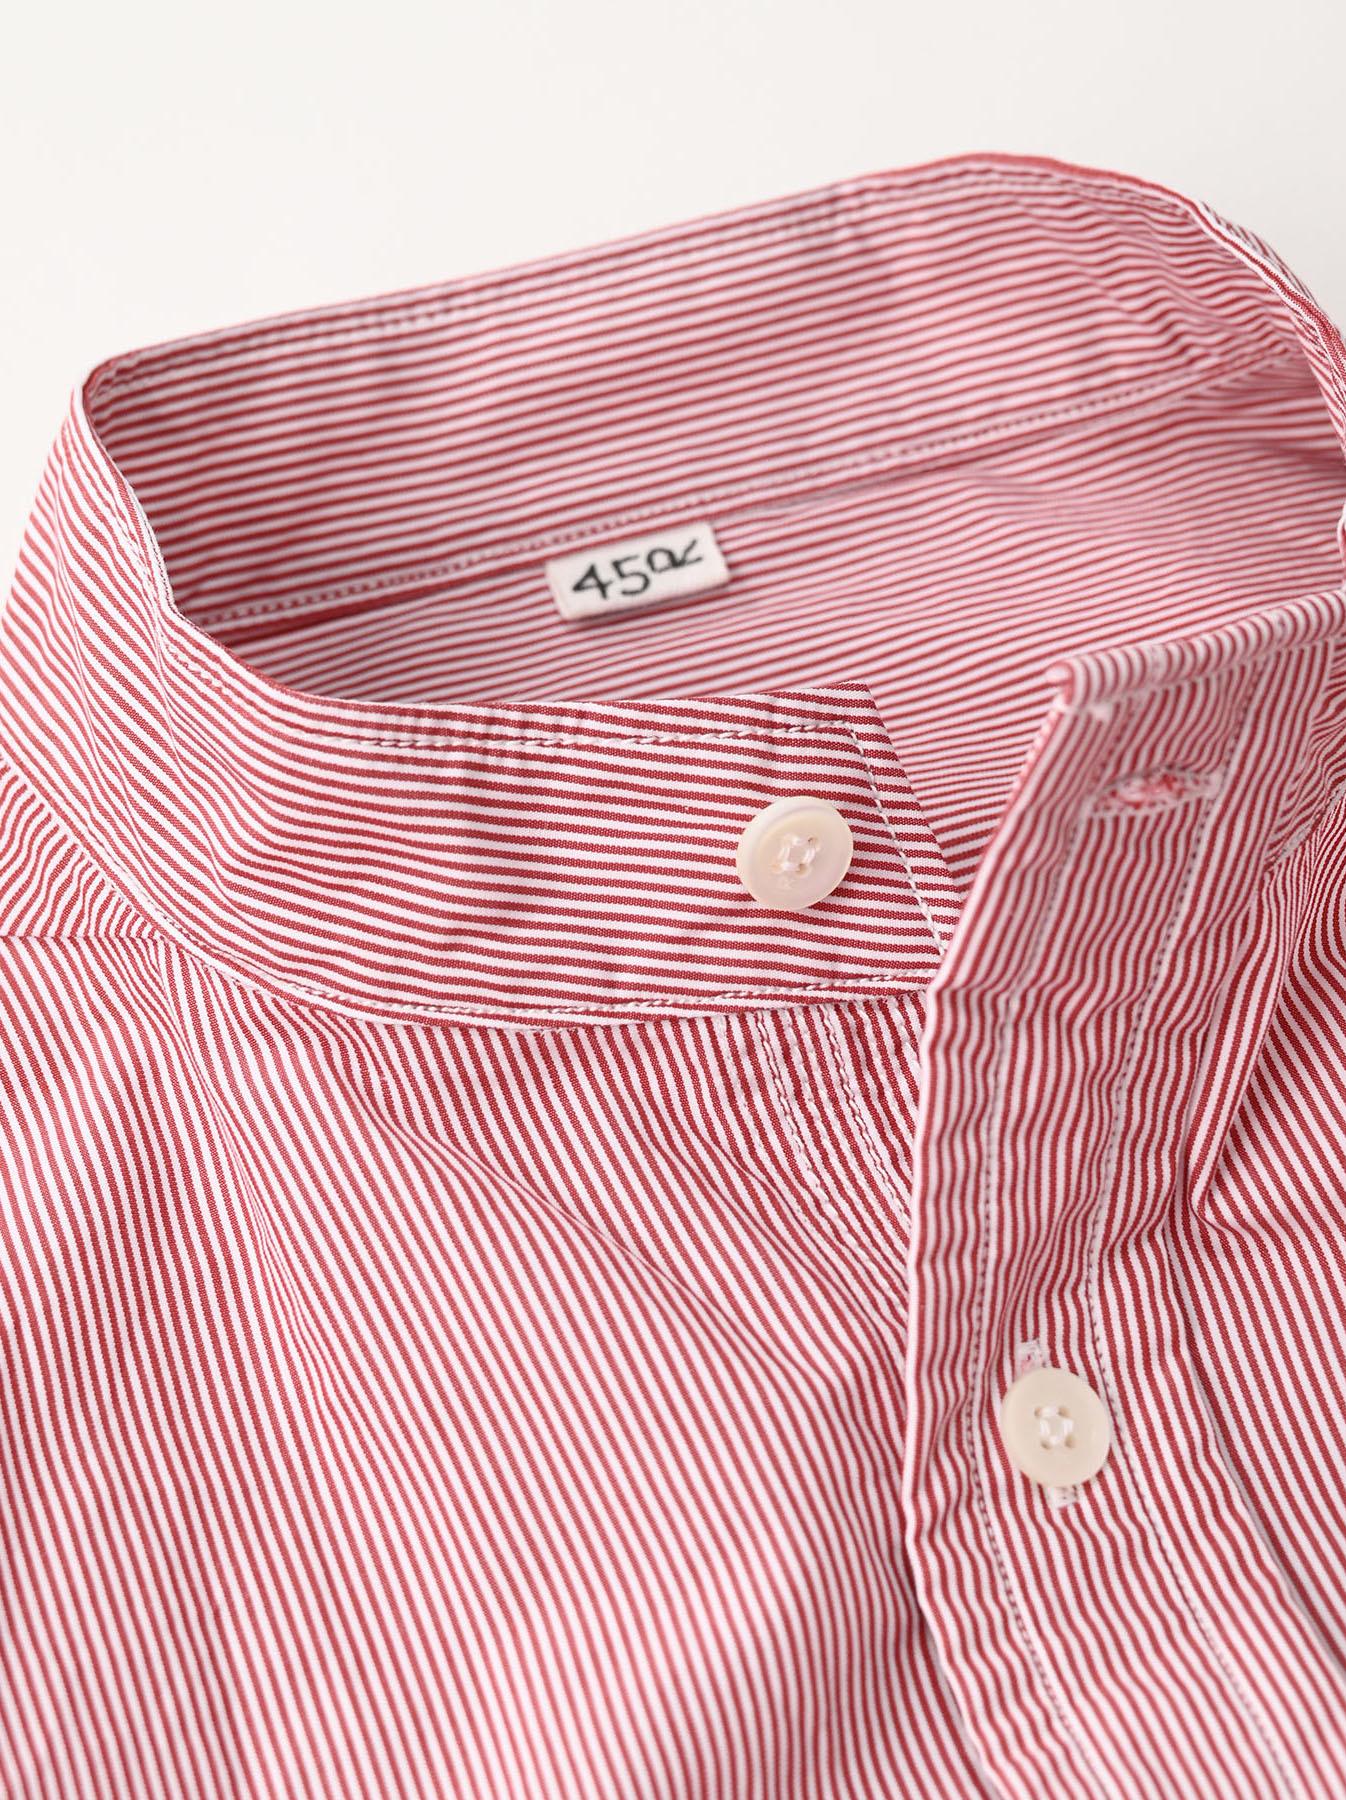 Miko Stand Collar 908 Ocean Shirt-9